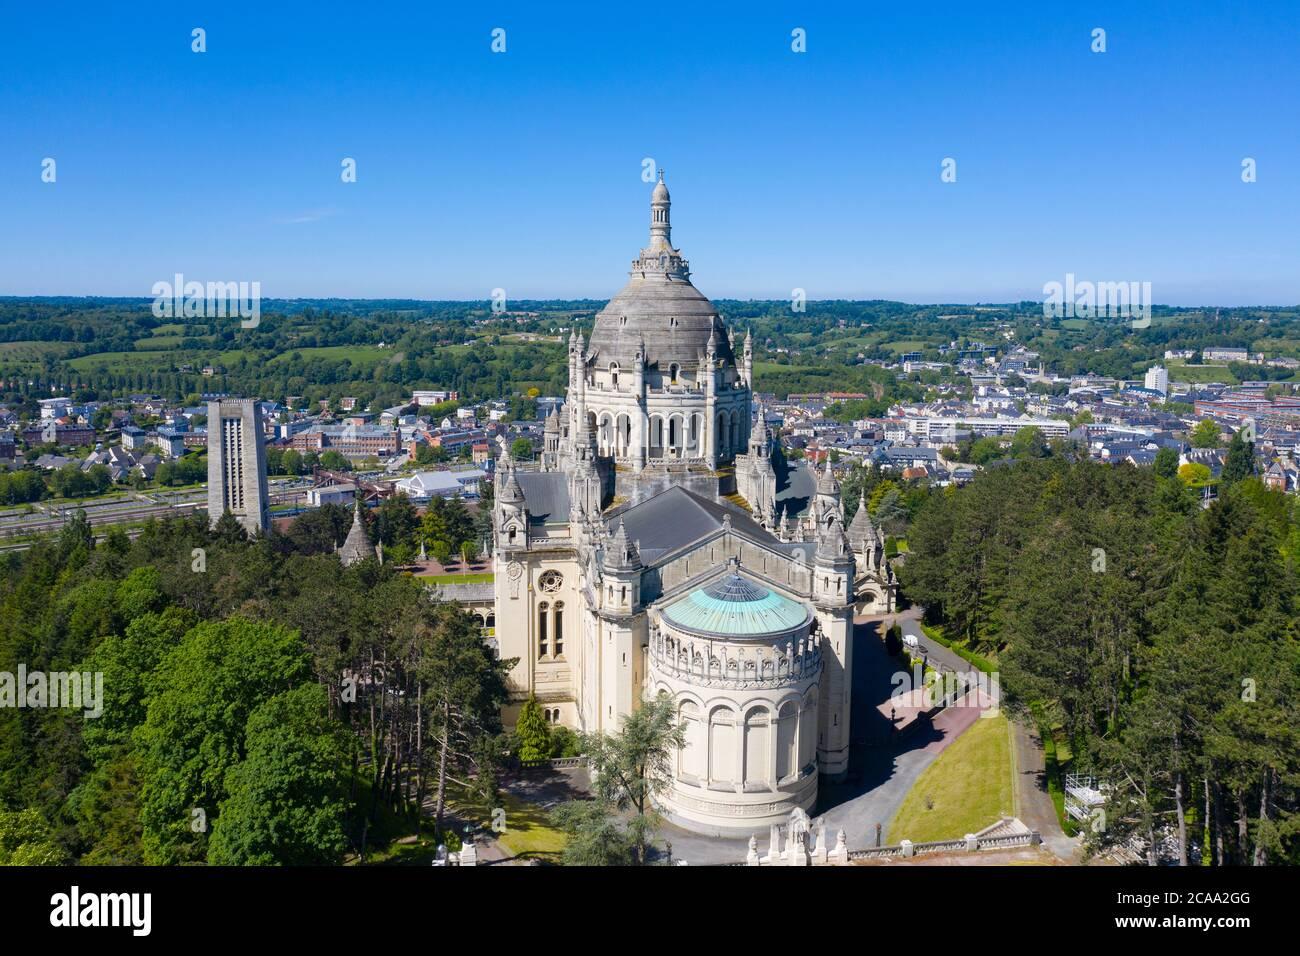 Veduta aerea della Basilica di Santa Teresa di Lisieux in Normandia Francia Foto Stock